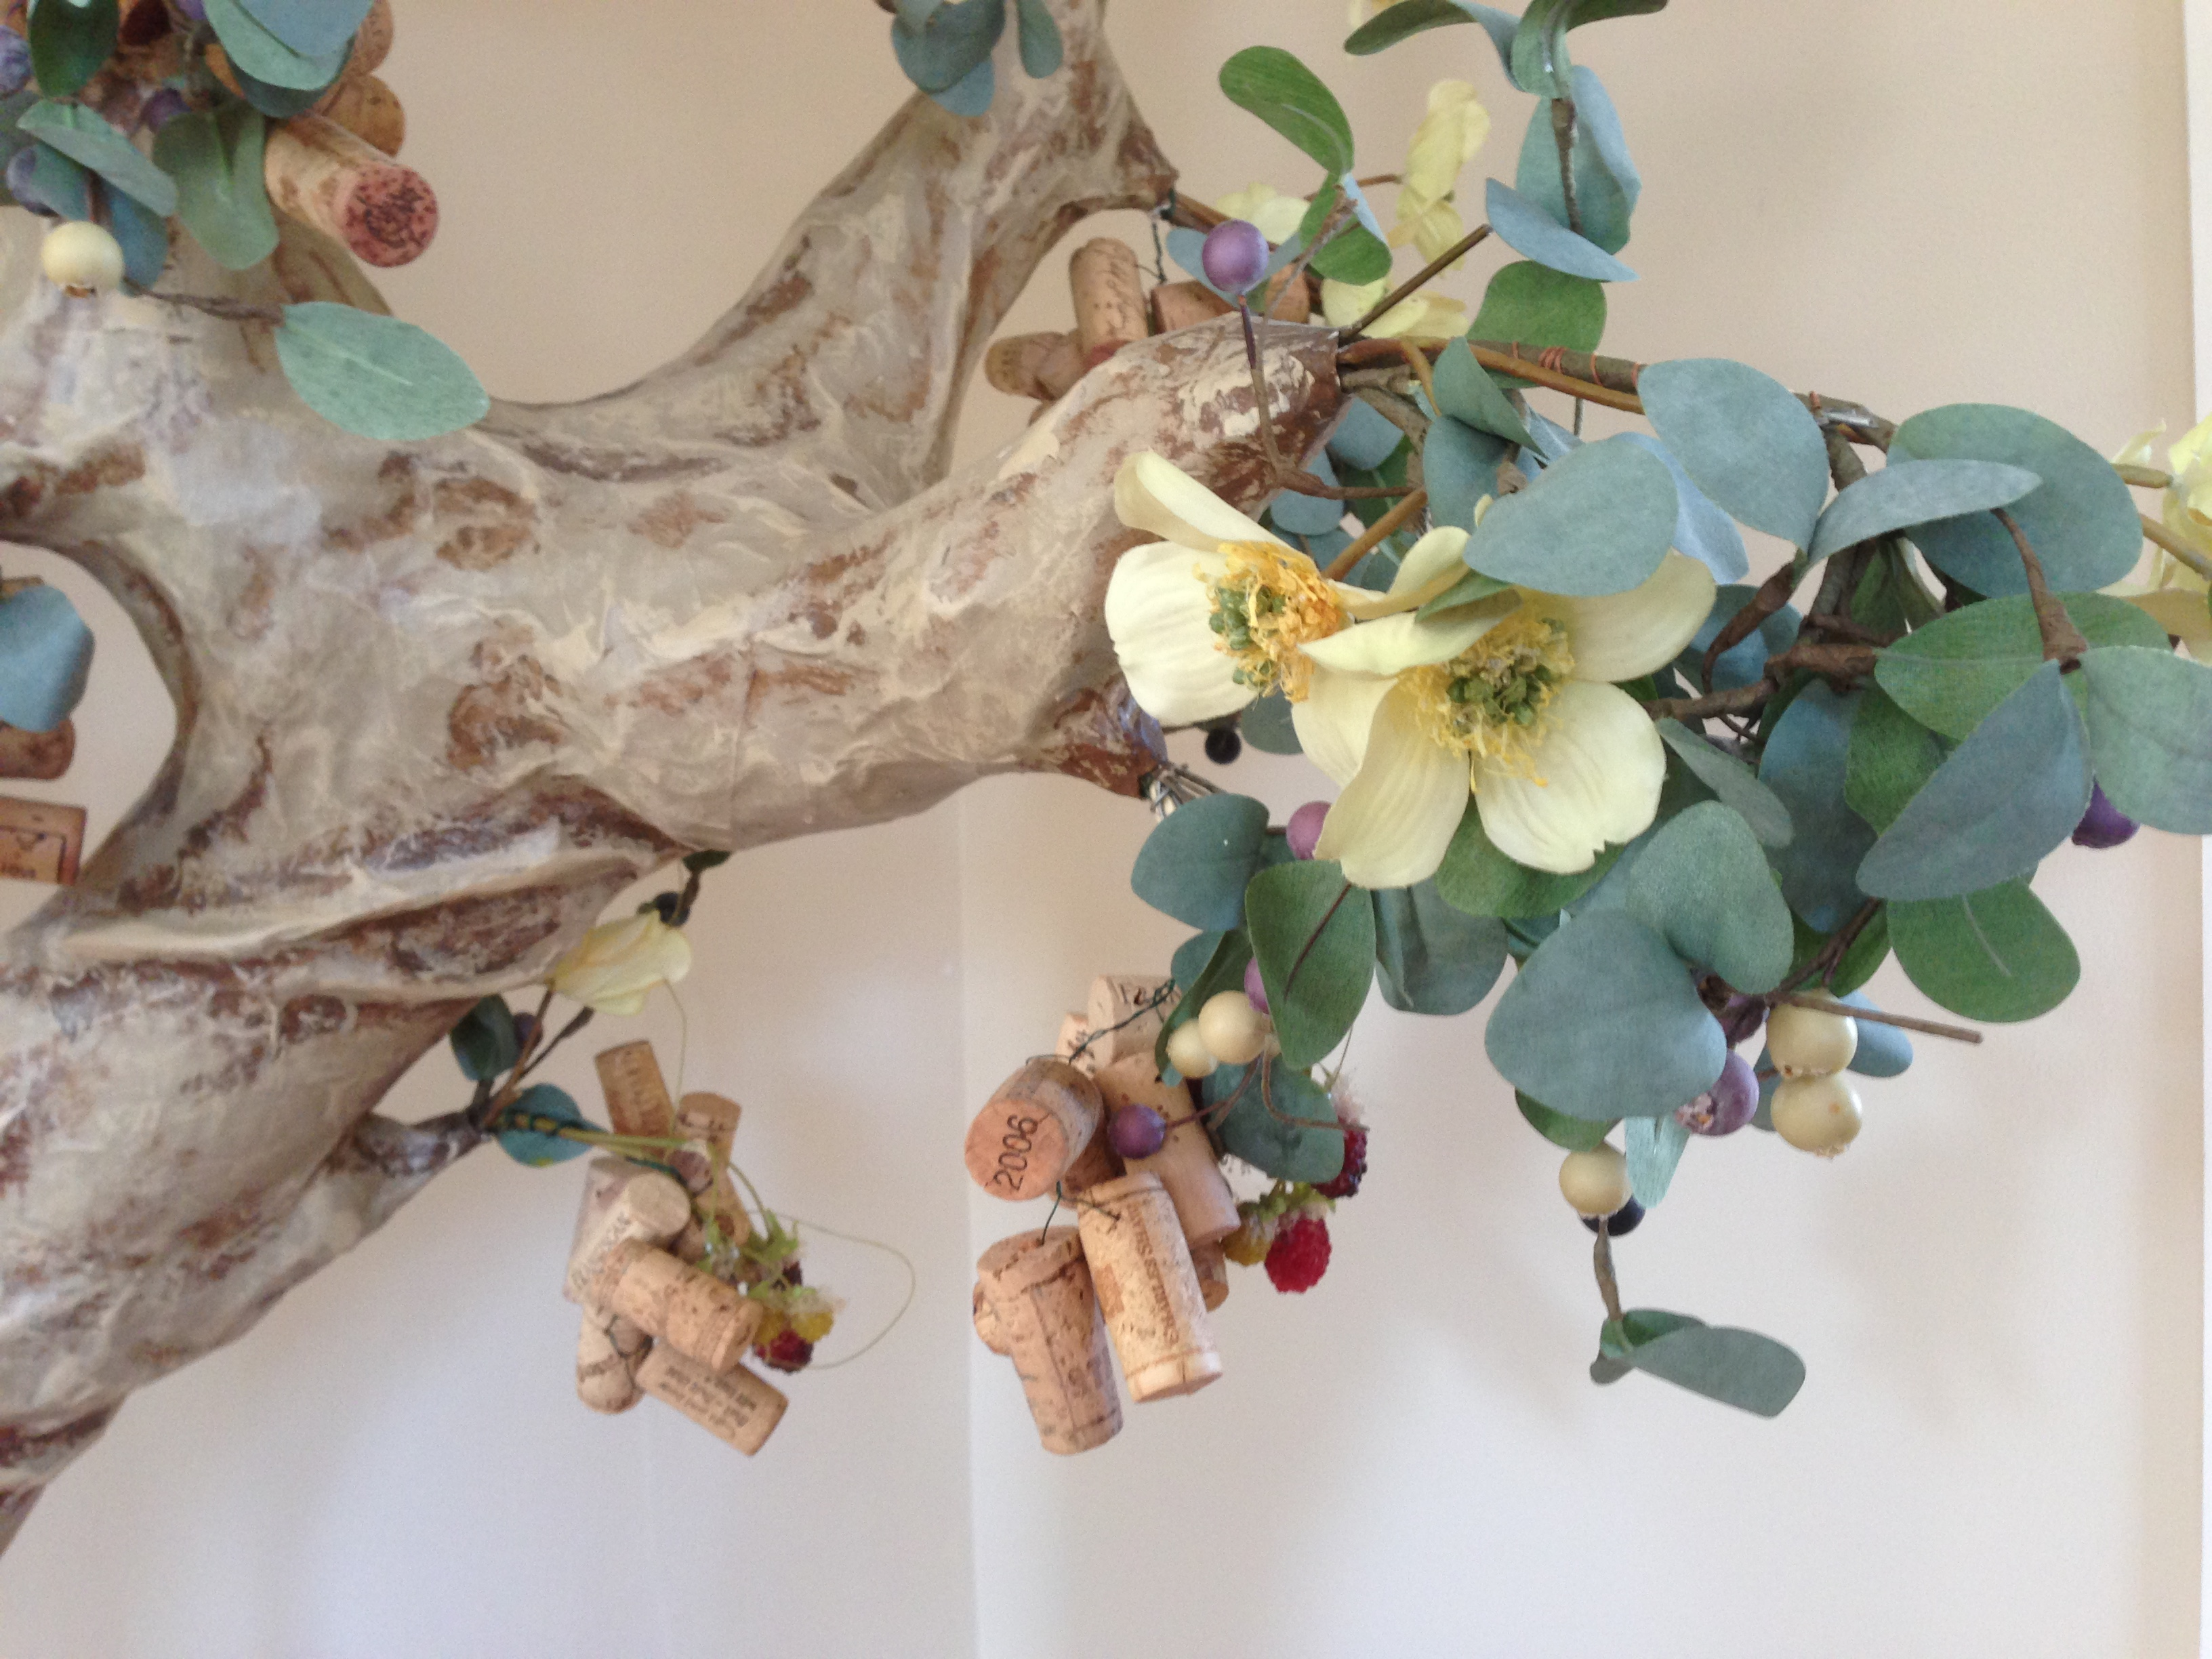 Ferdinand the Bull's cork tree